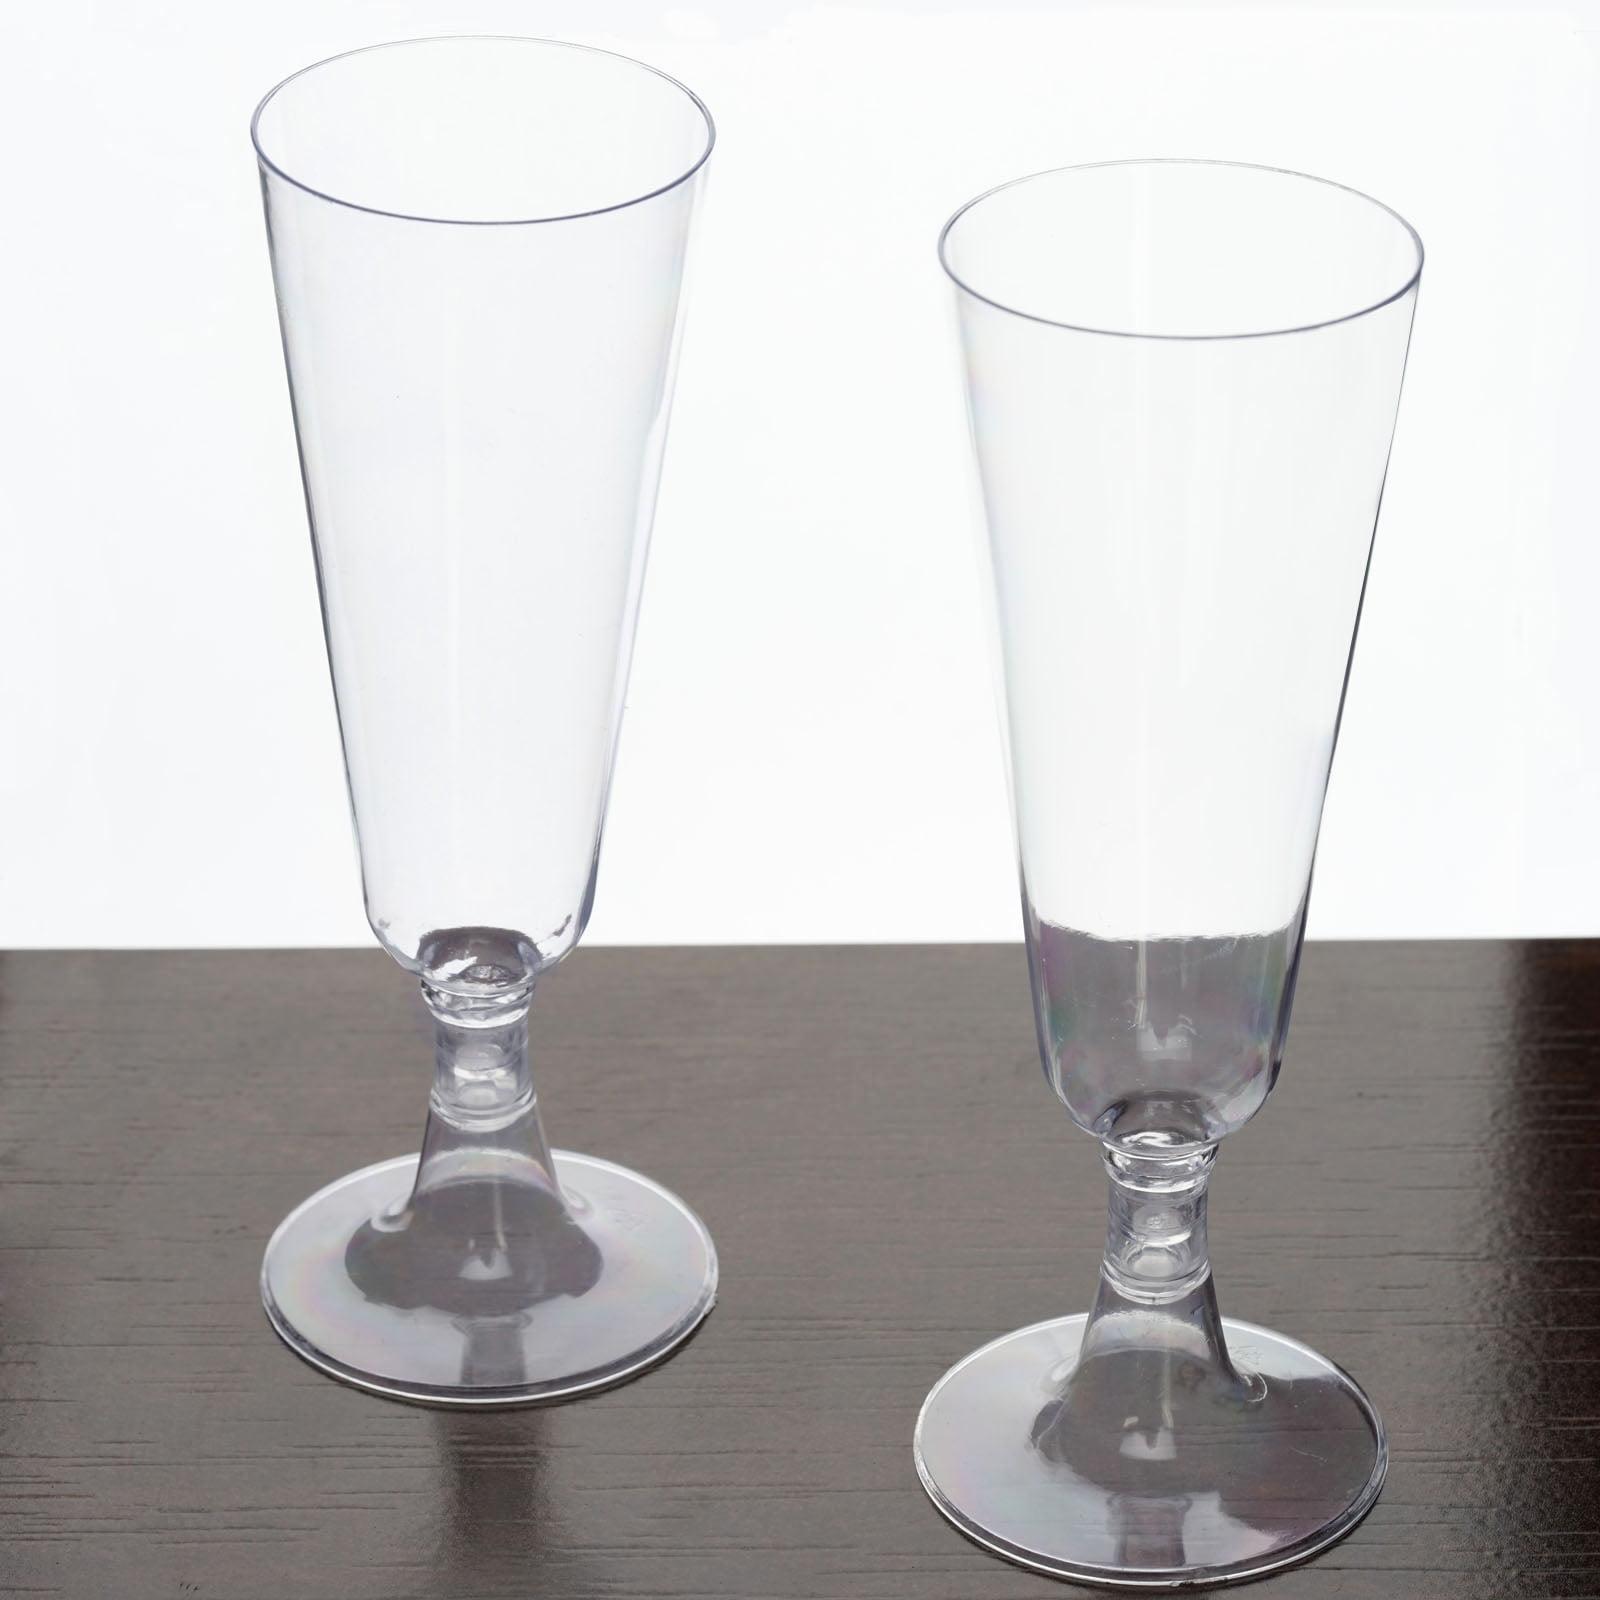 Efavormart 60 Pcs - 5oz Glittered Champagne Flutes Cocktail Disposable Plastic Glasses For Wedding Party Events